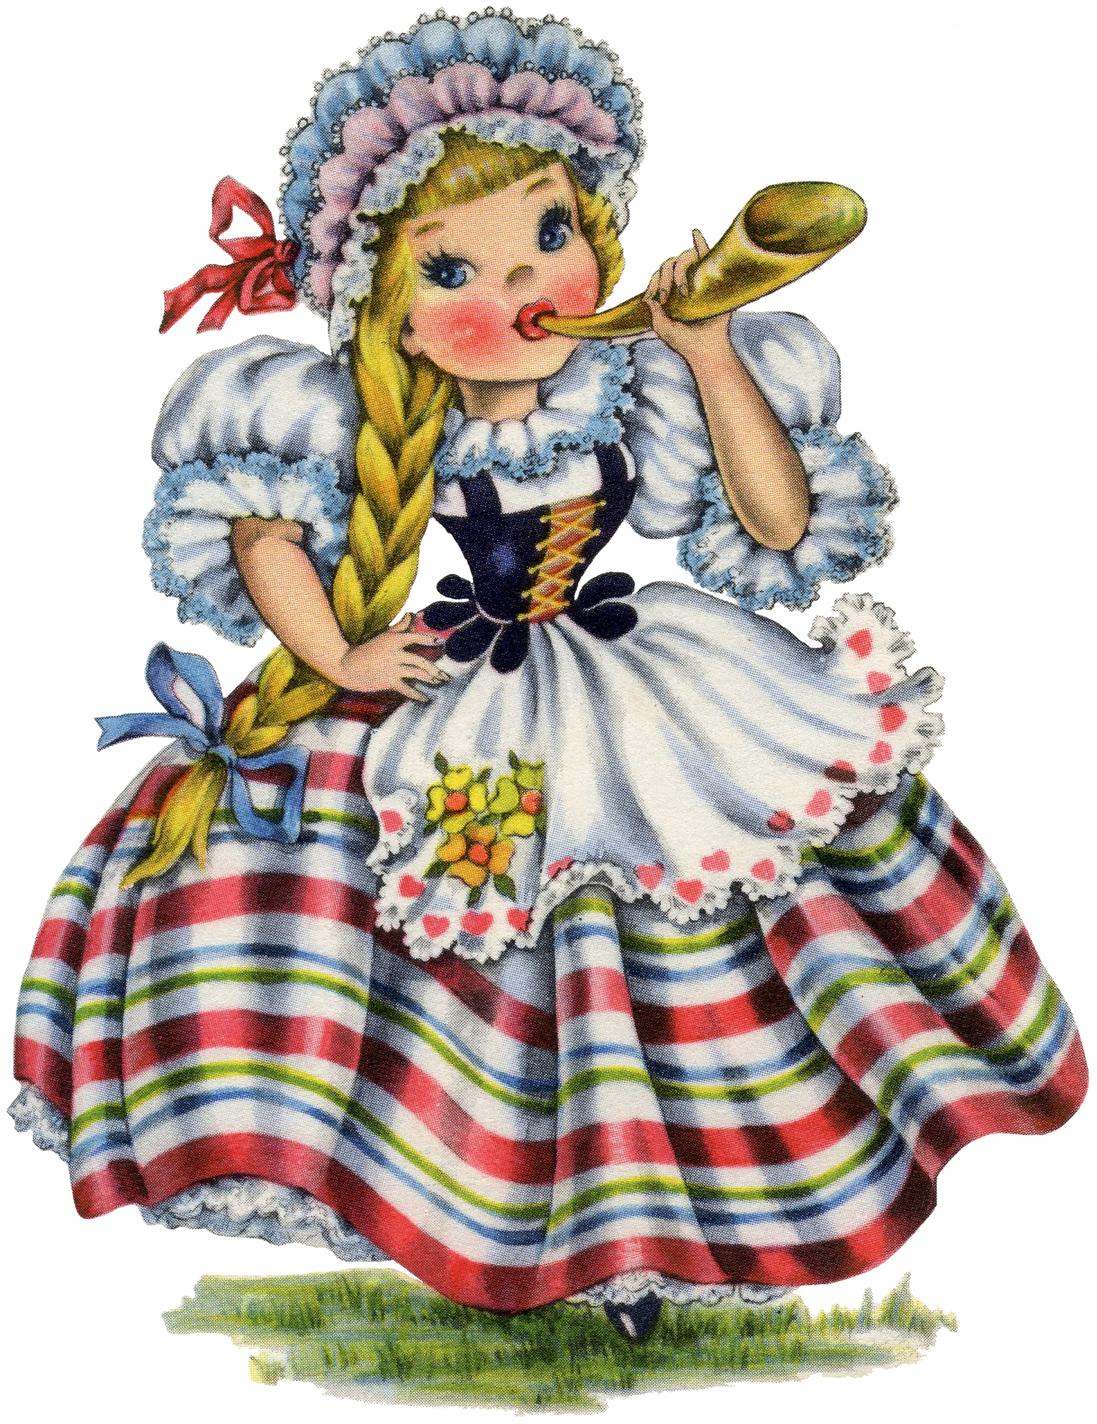 Cute Retro Swiss Doll Image! - The Graphics Fairy